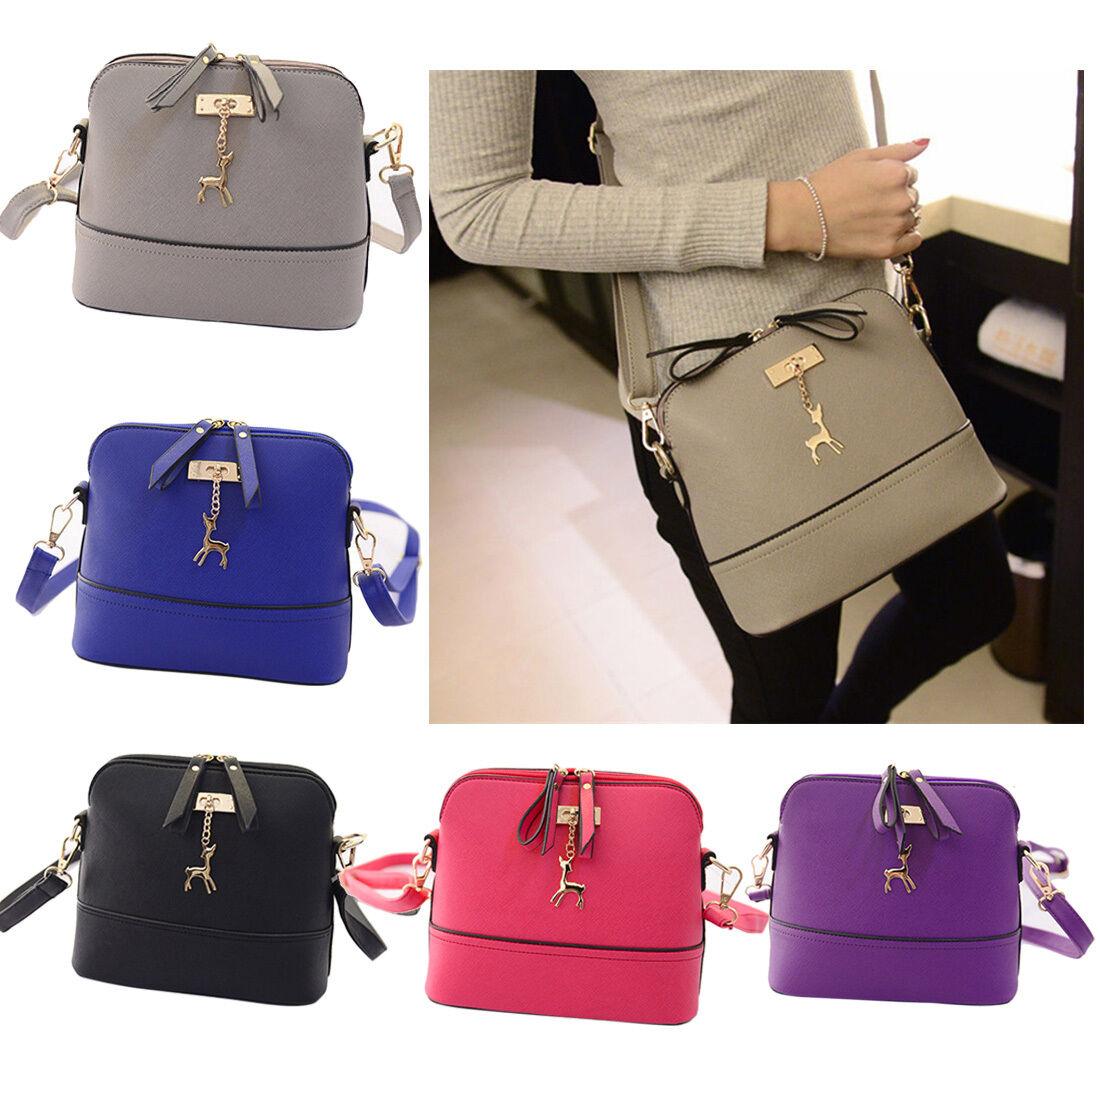 Bag - Women Ladies Leather Shoulder Bag Tote Purse Handbag Messenger Crossbody Satchel